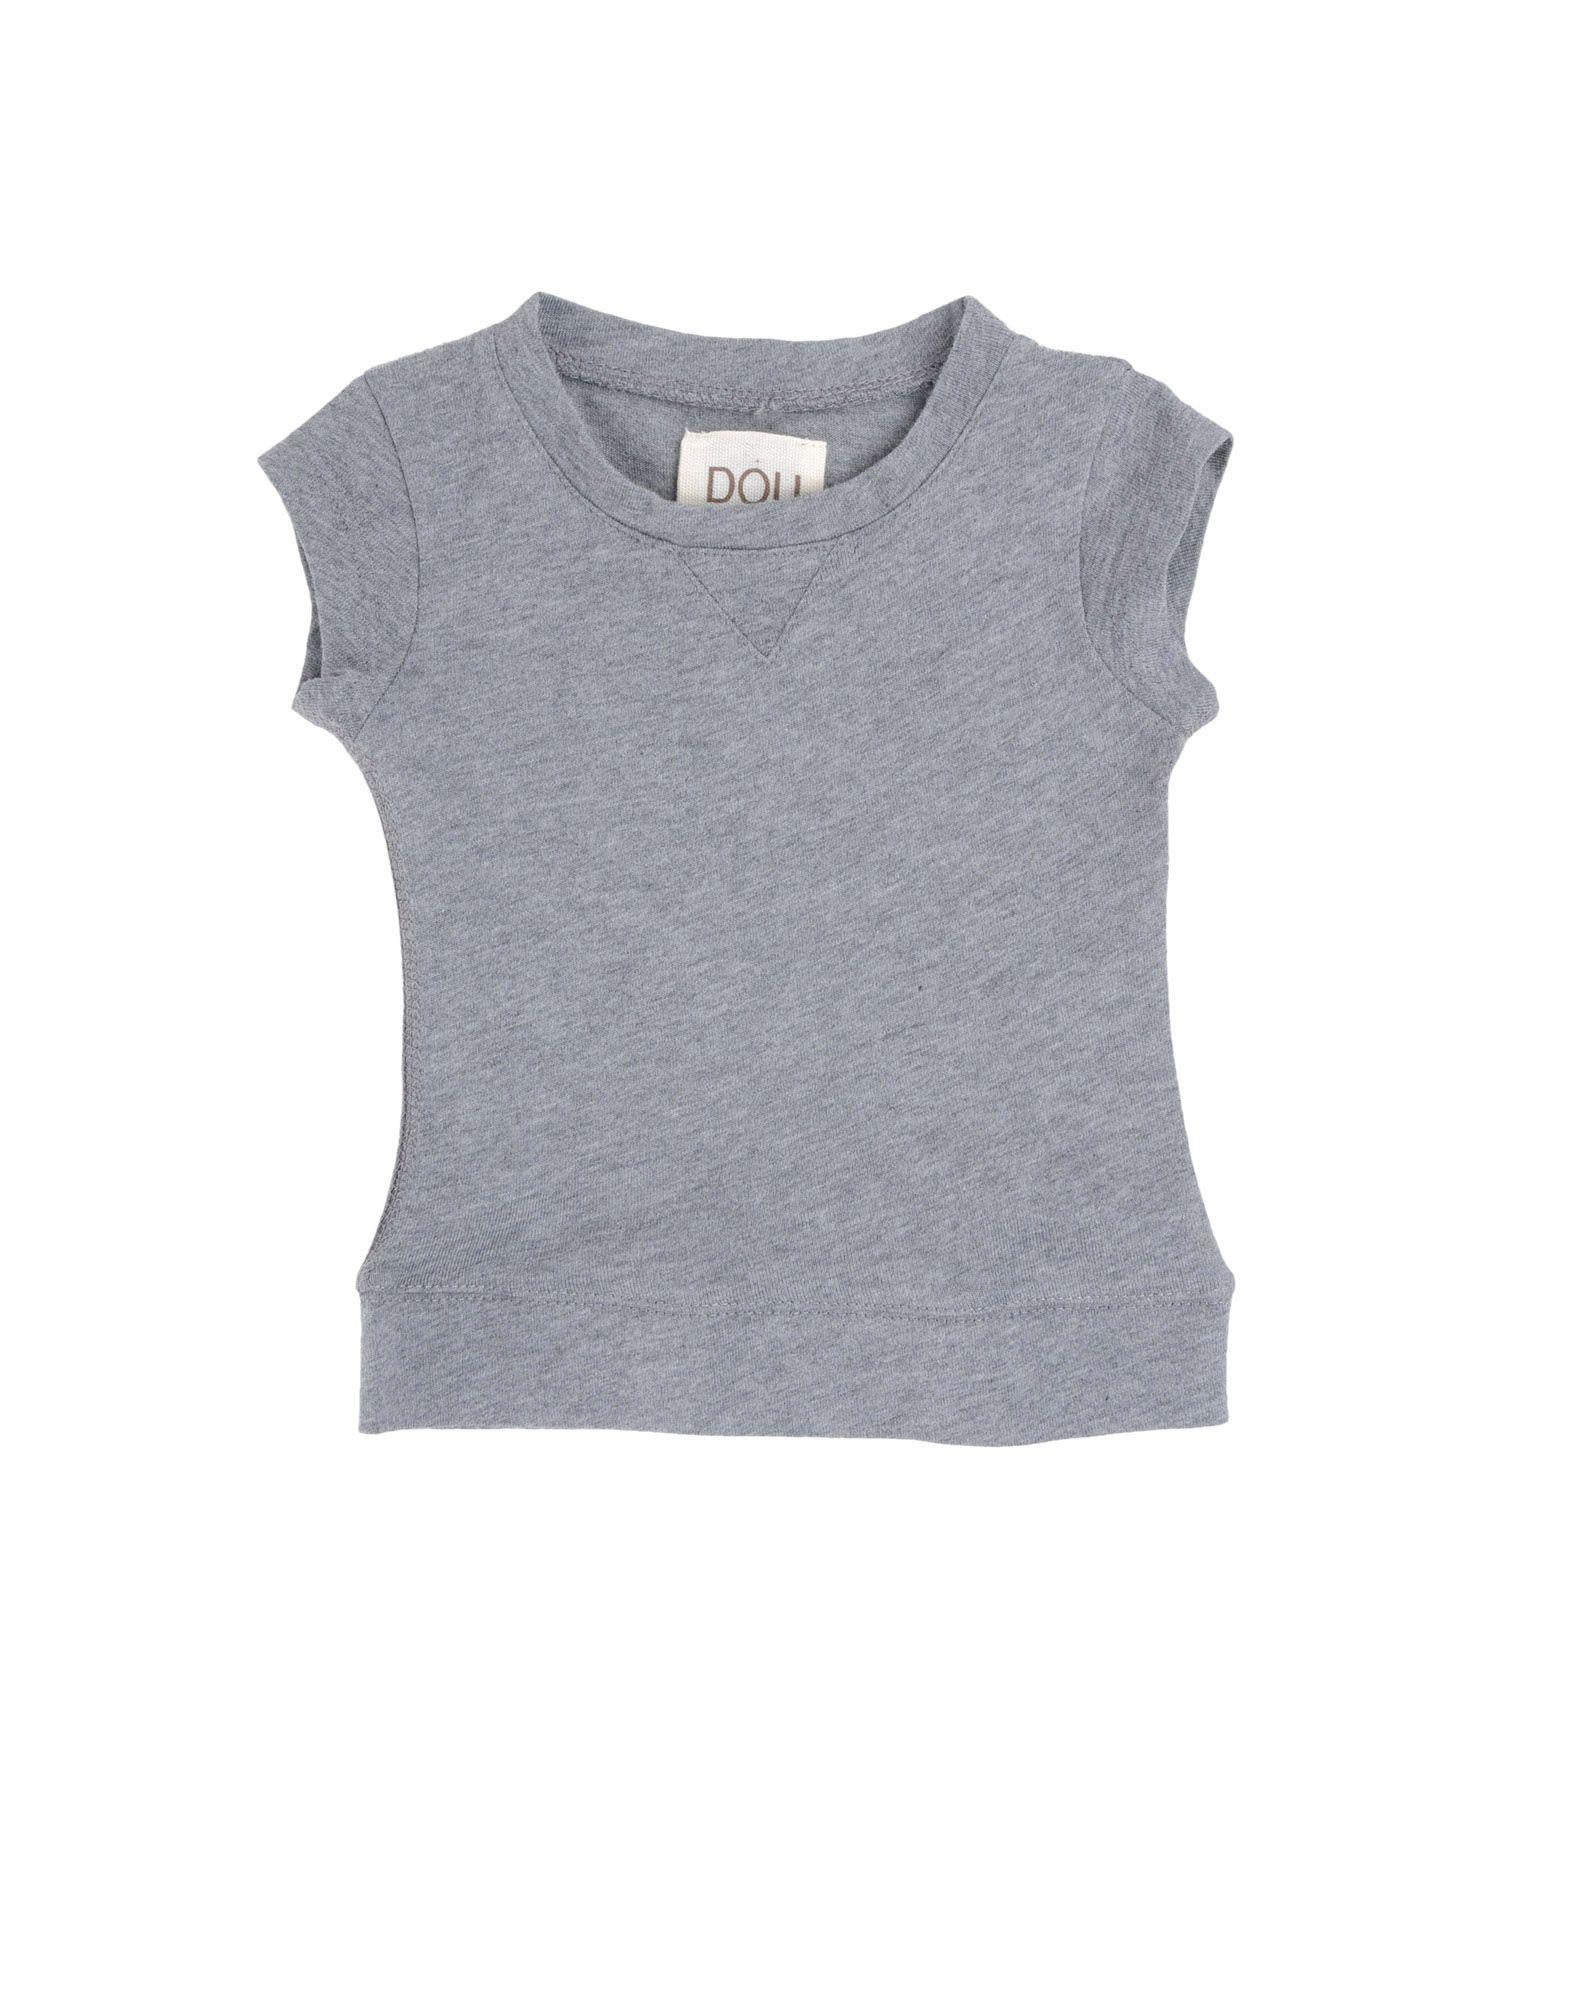 DOUUOD Mädchen 0-24 monate Kurzärmliges T-Shirt Farbe Grau Größe 3